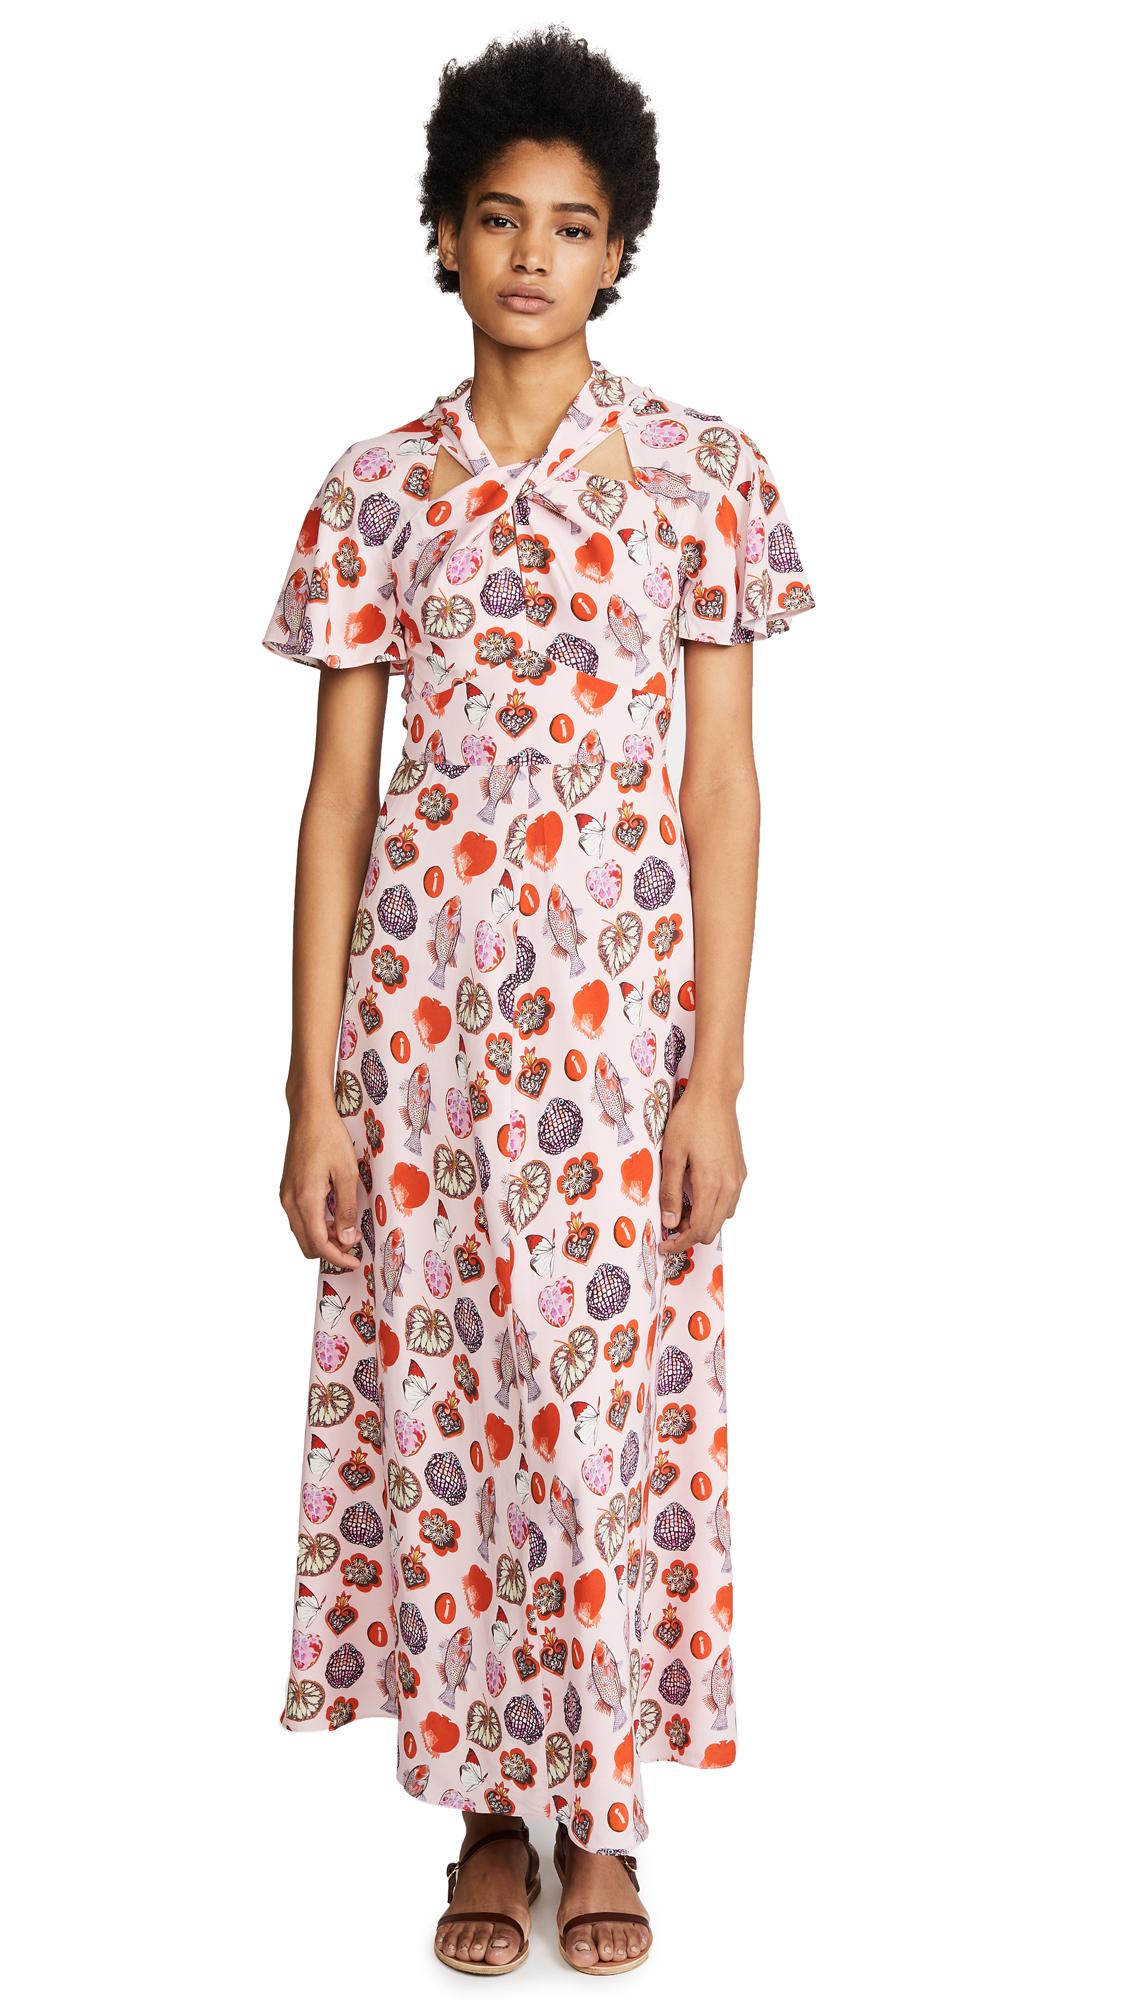 Temperley London Elixir Dress In Shell Mix